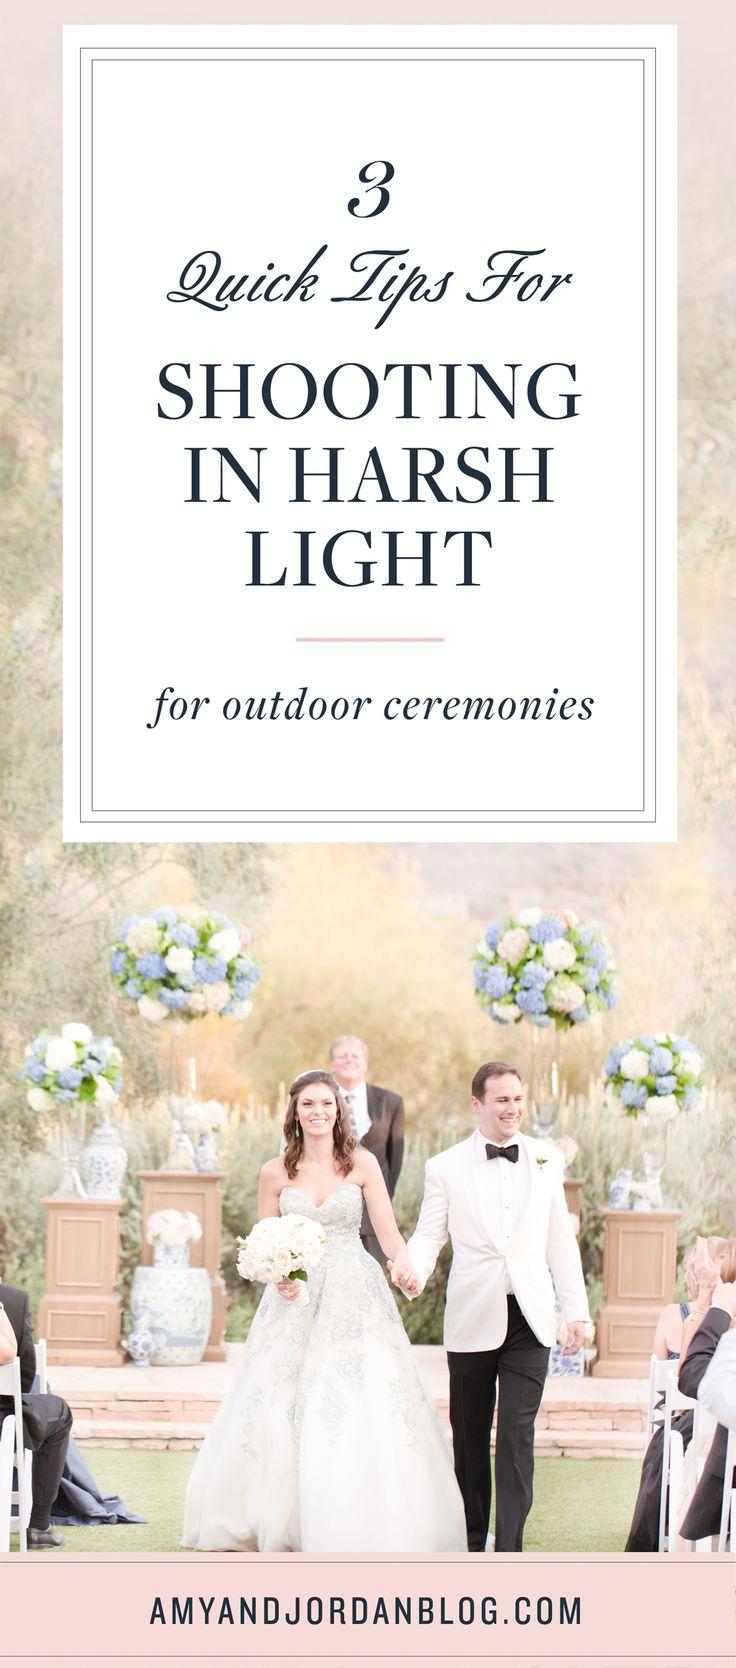 3 quick tips for shooting in harsh light for outdoor ceremonies.